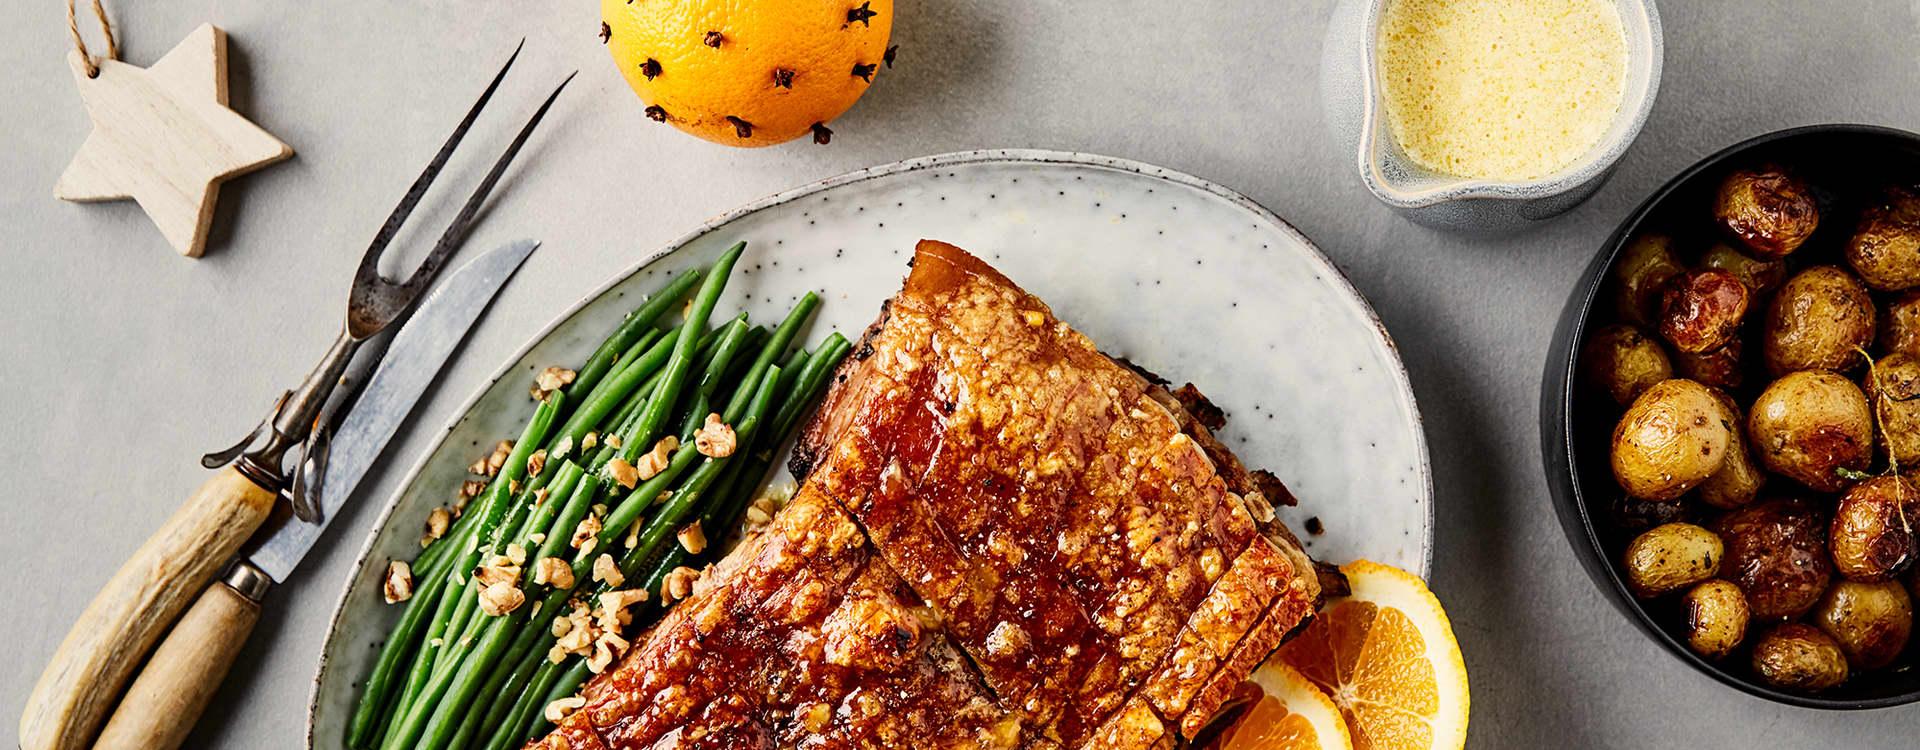 Appelsinglasert ribbe med appelsinsaus, ovnsbakte poteter og aspargesbønnesalat